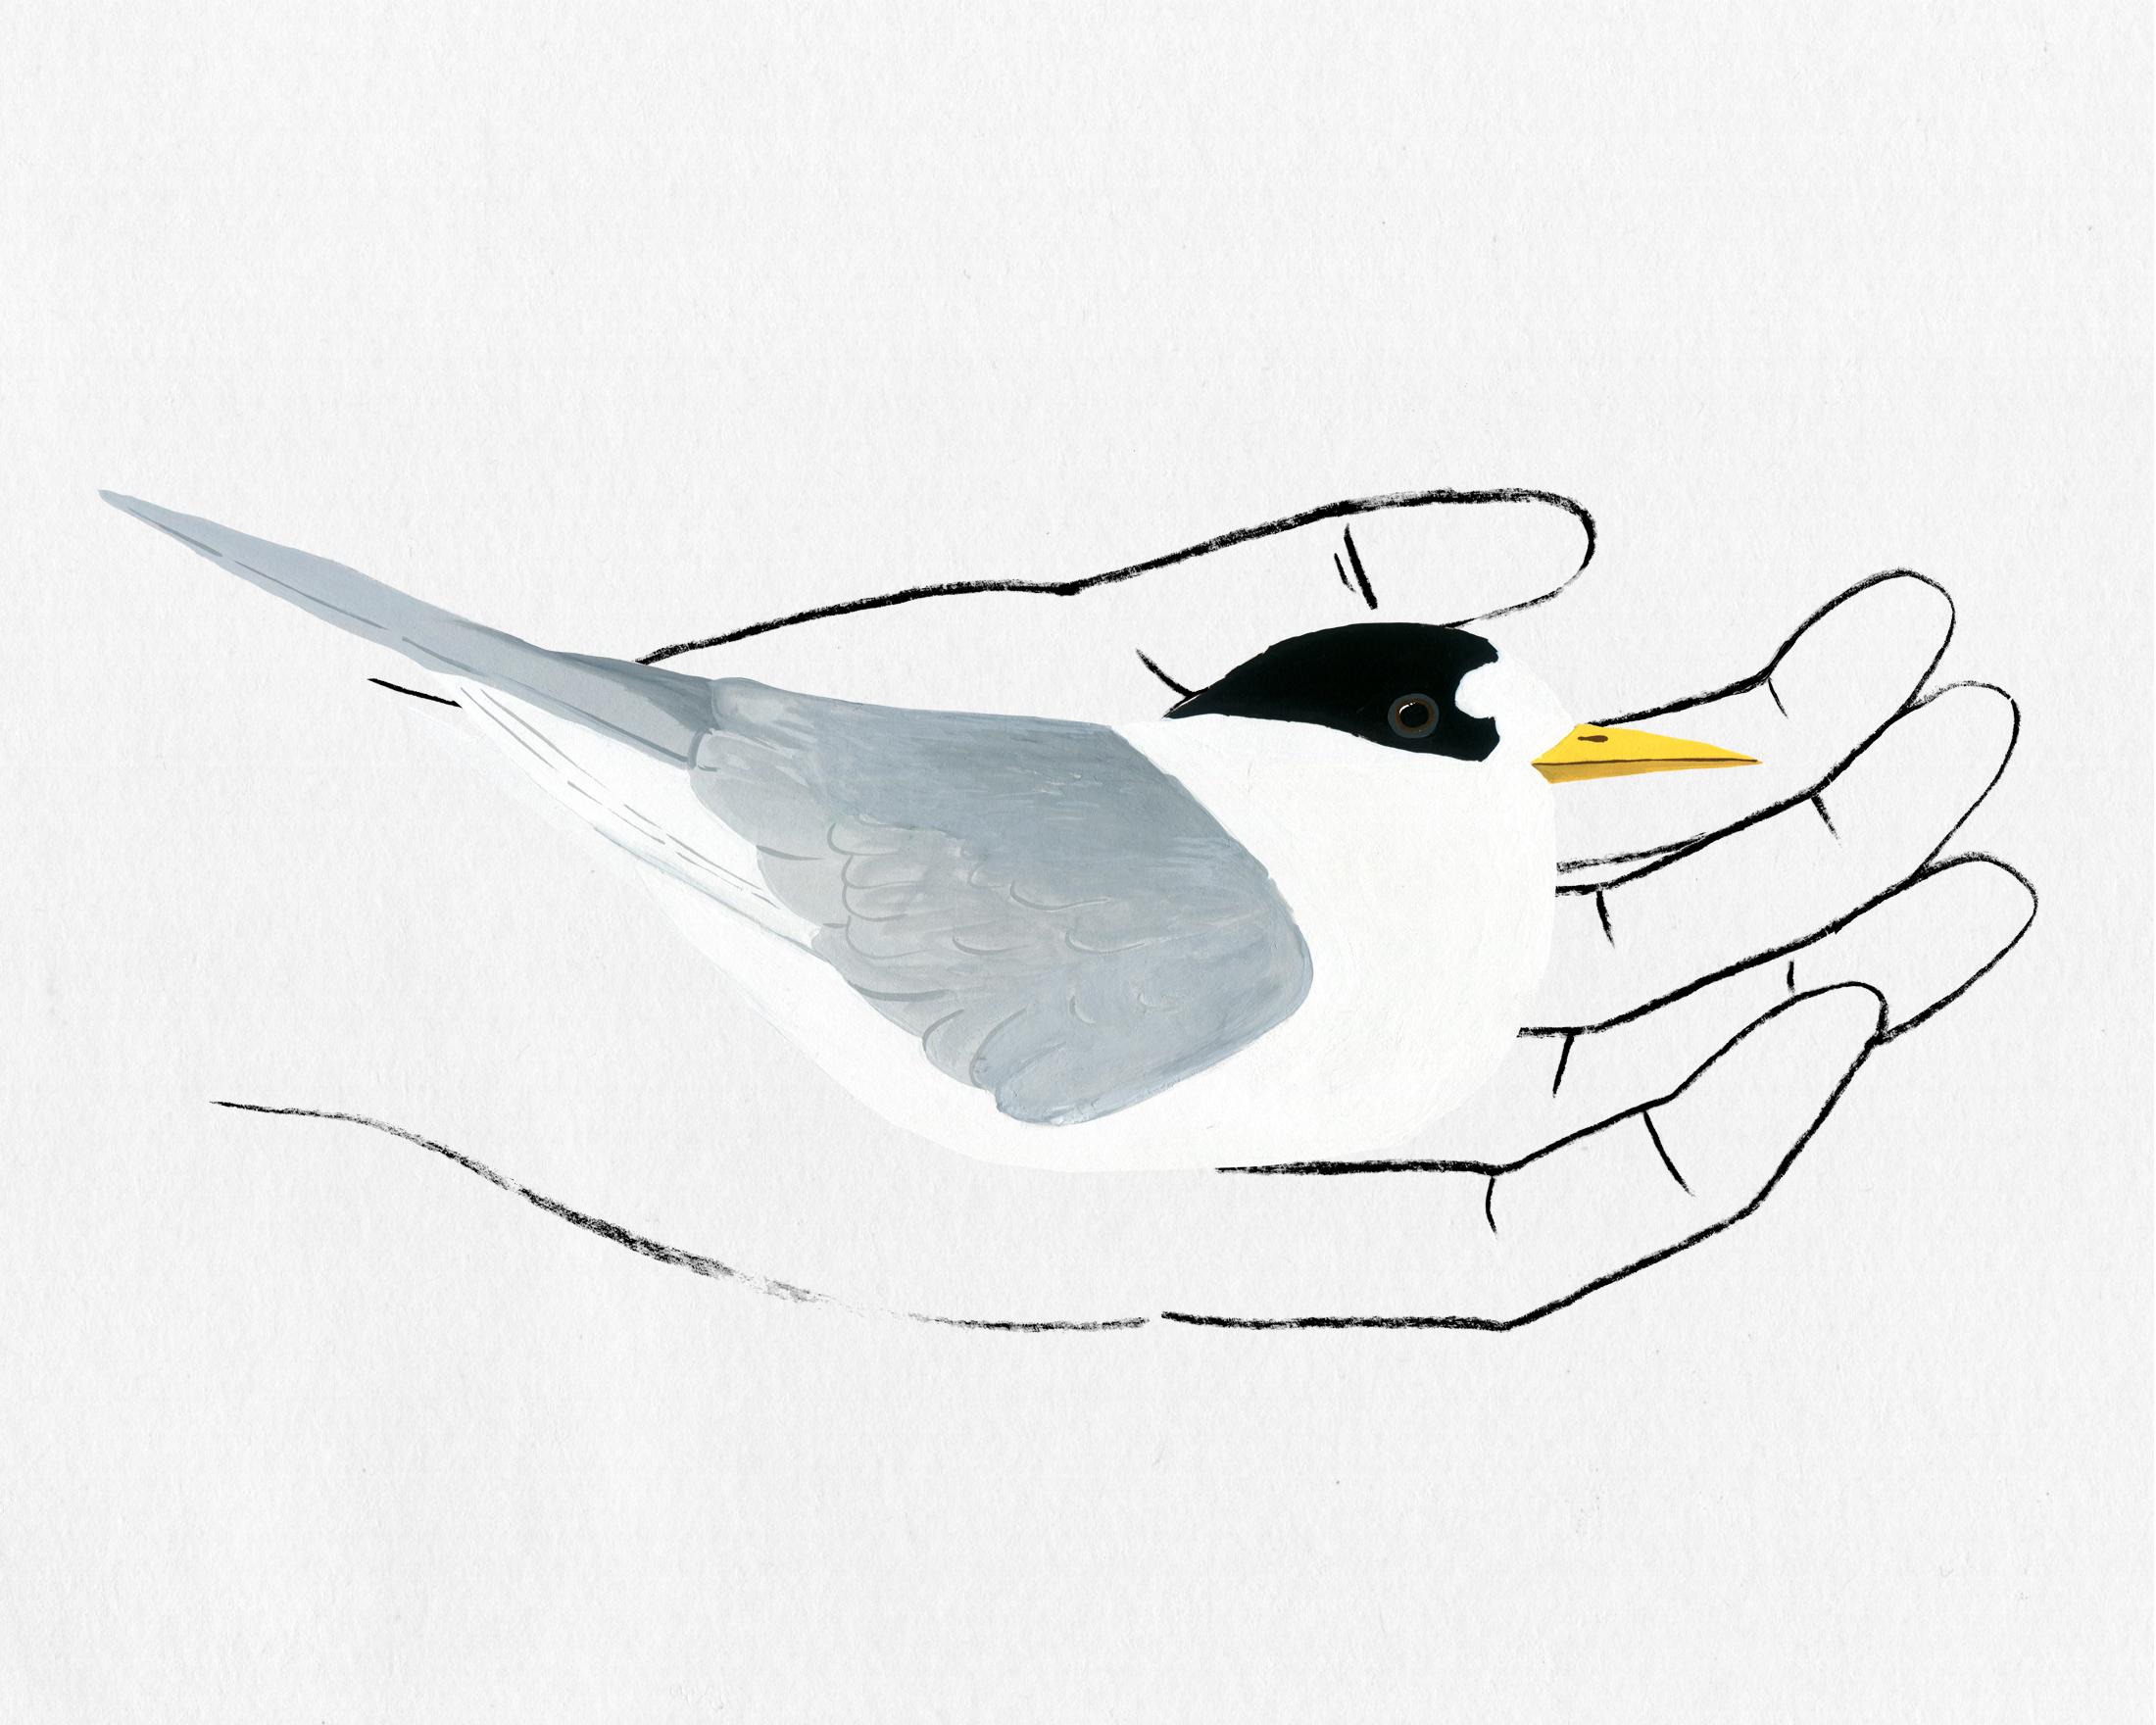 bird in hand series - fairy tern